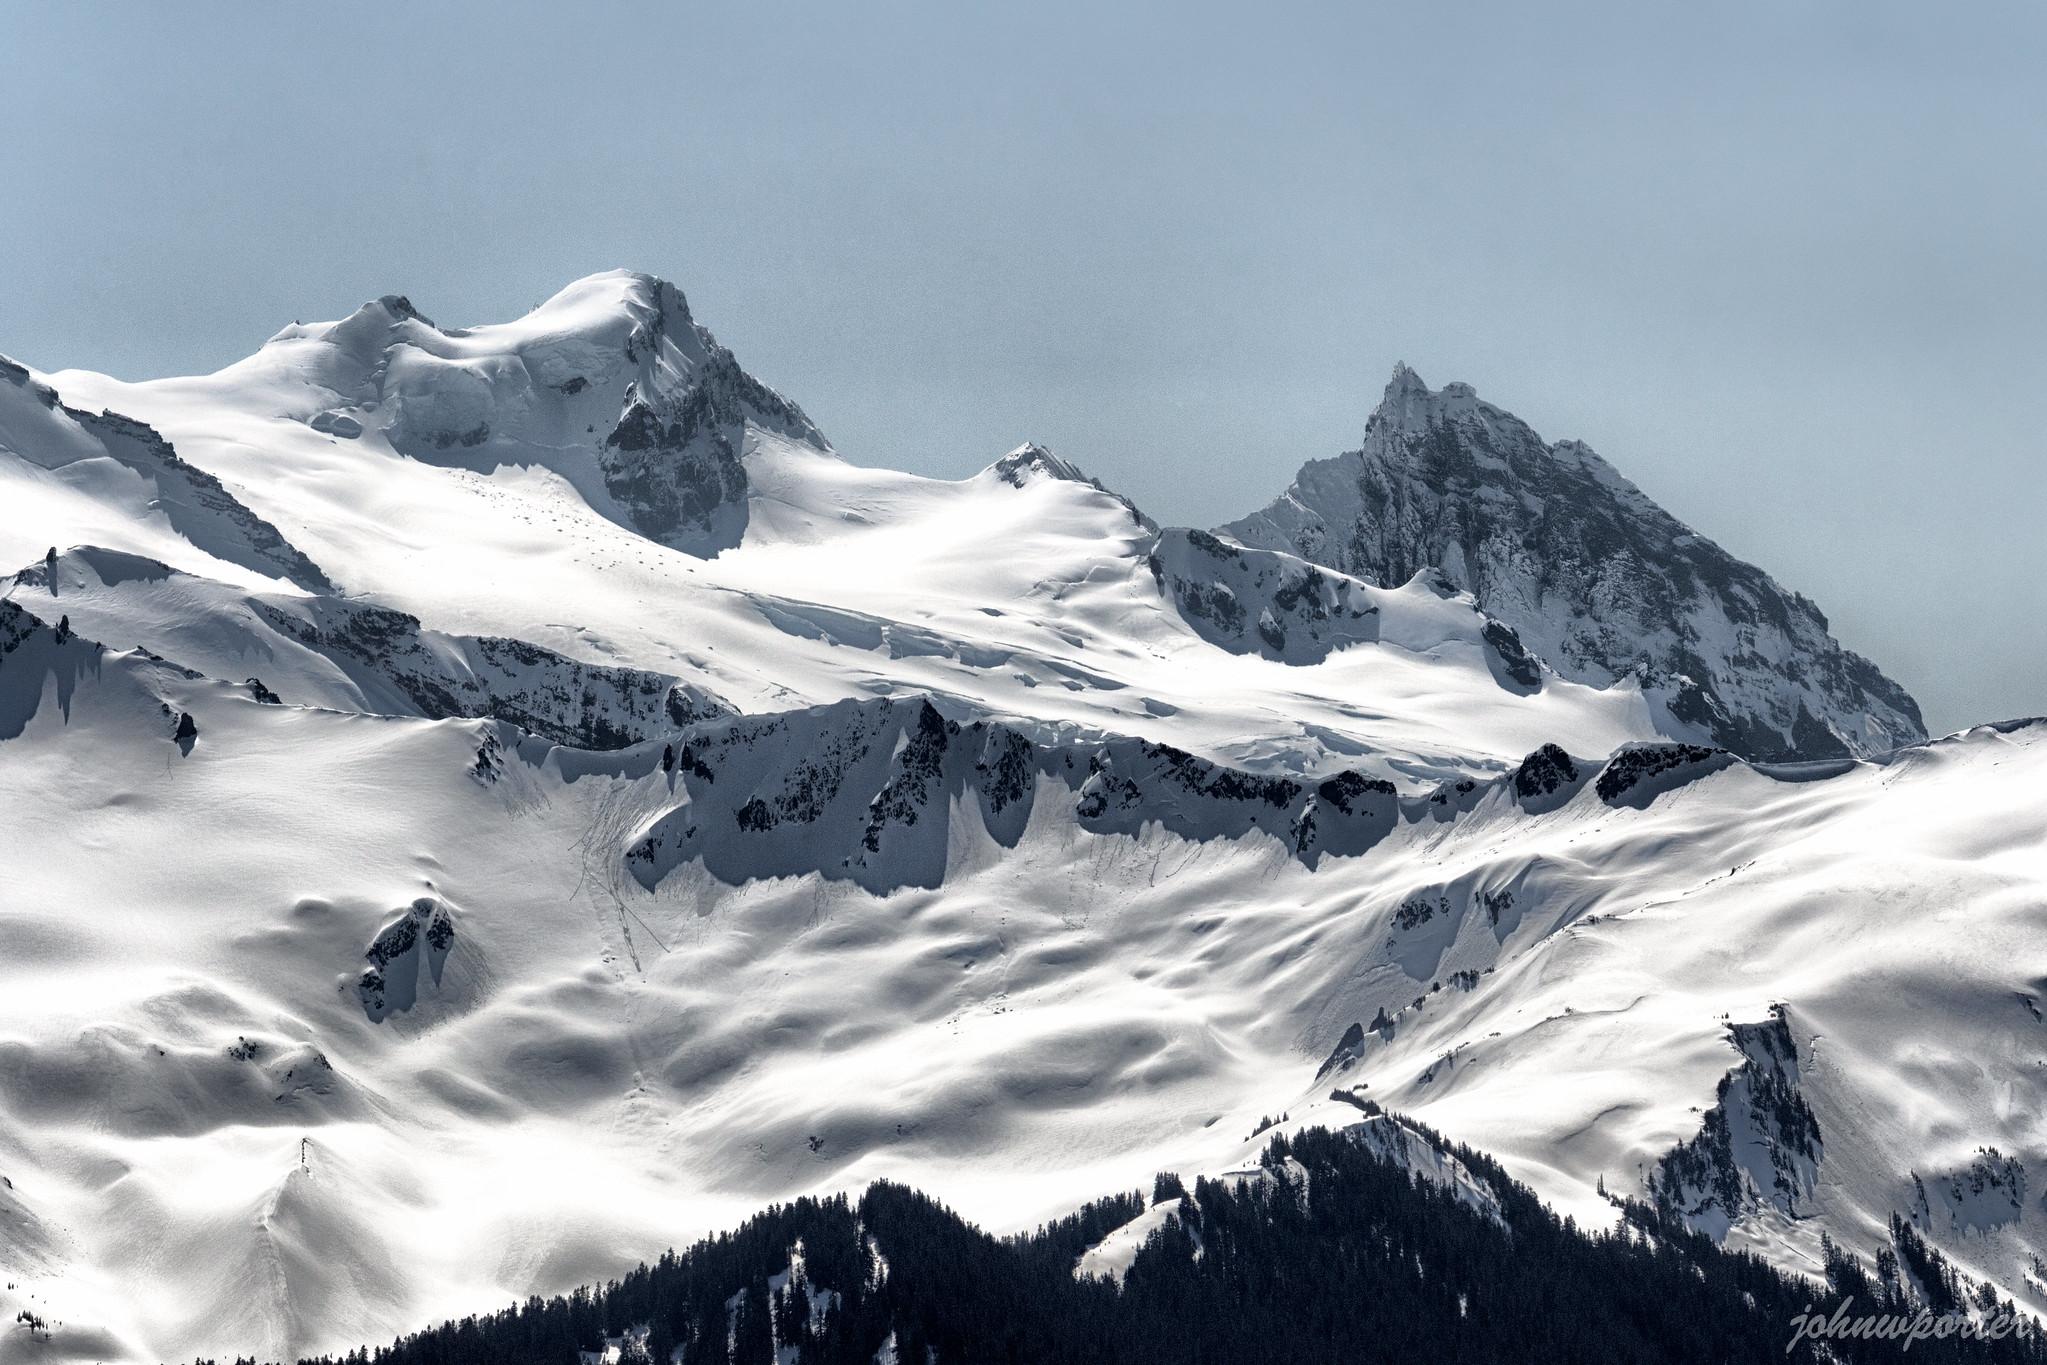 Colfax Peak and Lincoln Peak